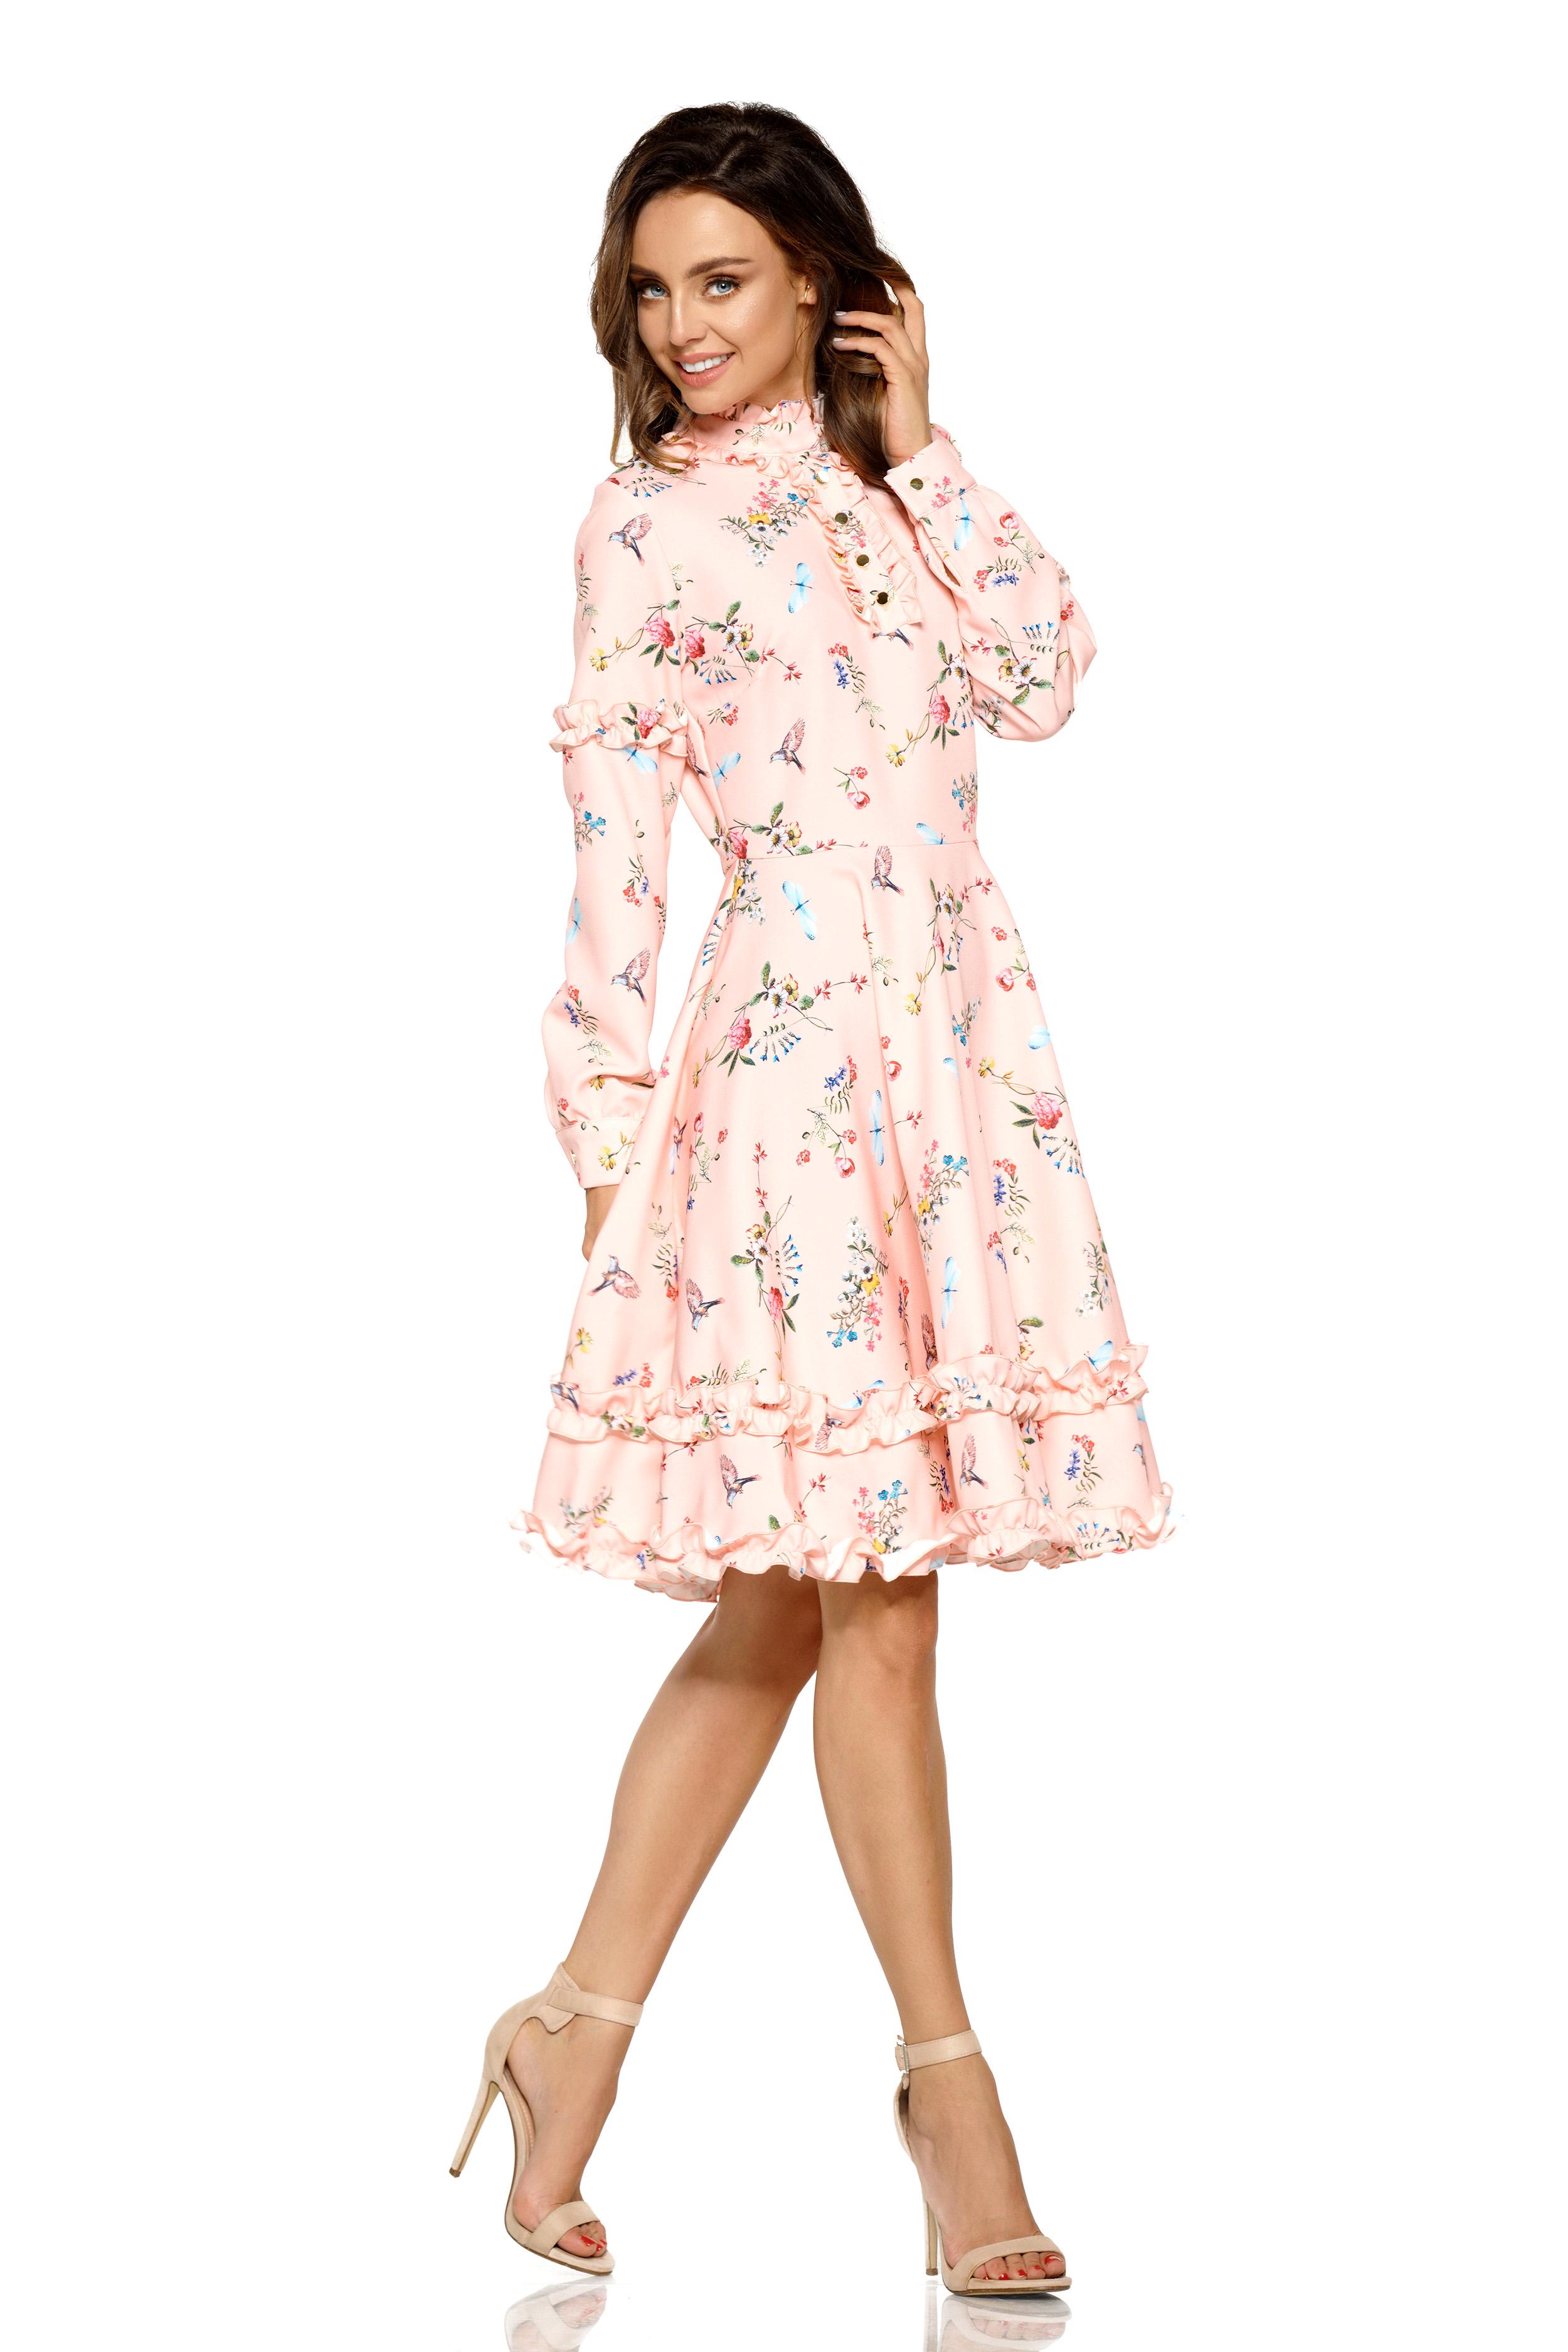 024d6f912d9 Γυναικεία Ρούχα, Γυναικεία Φορέματα